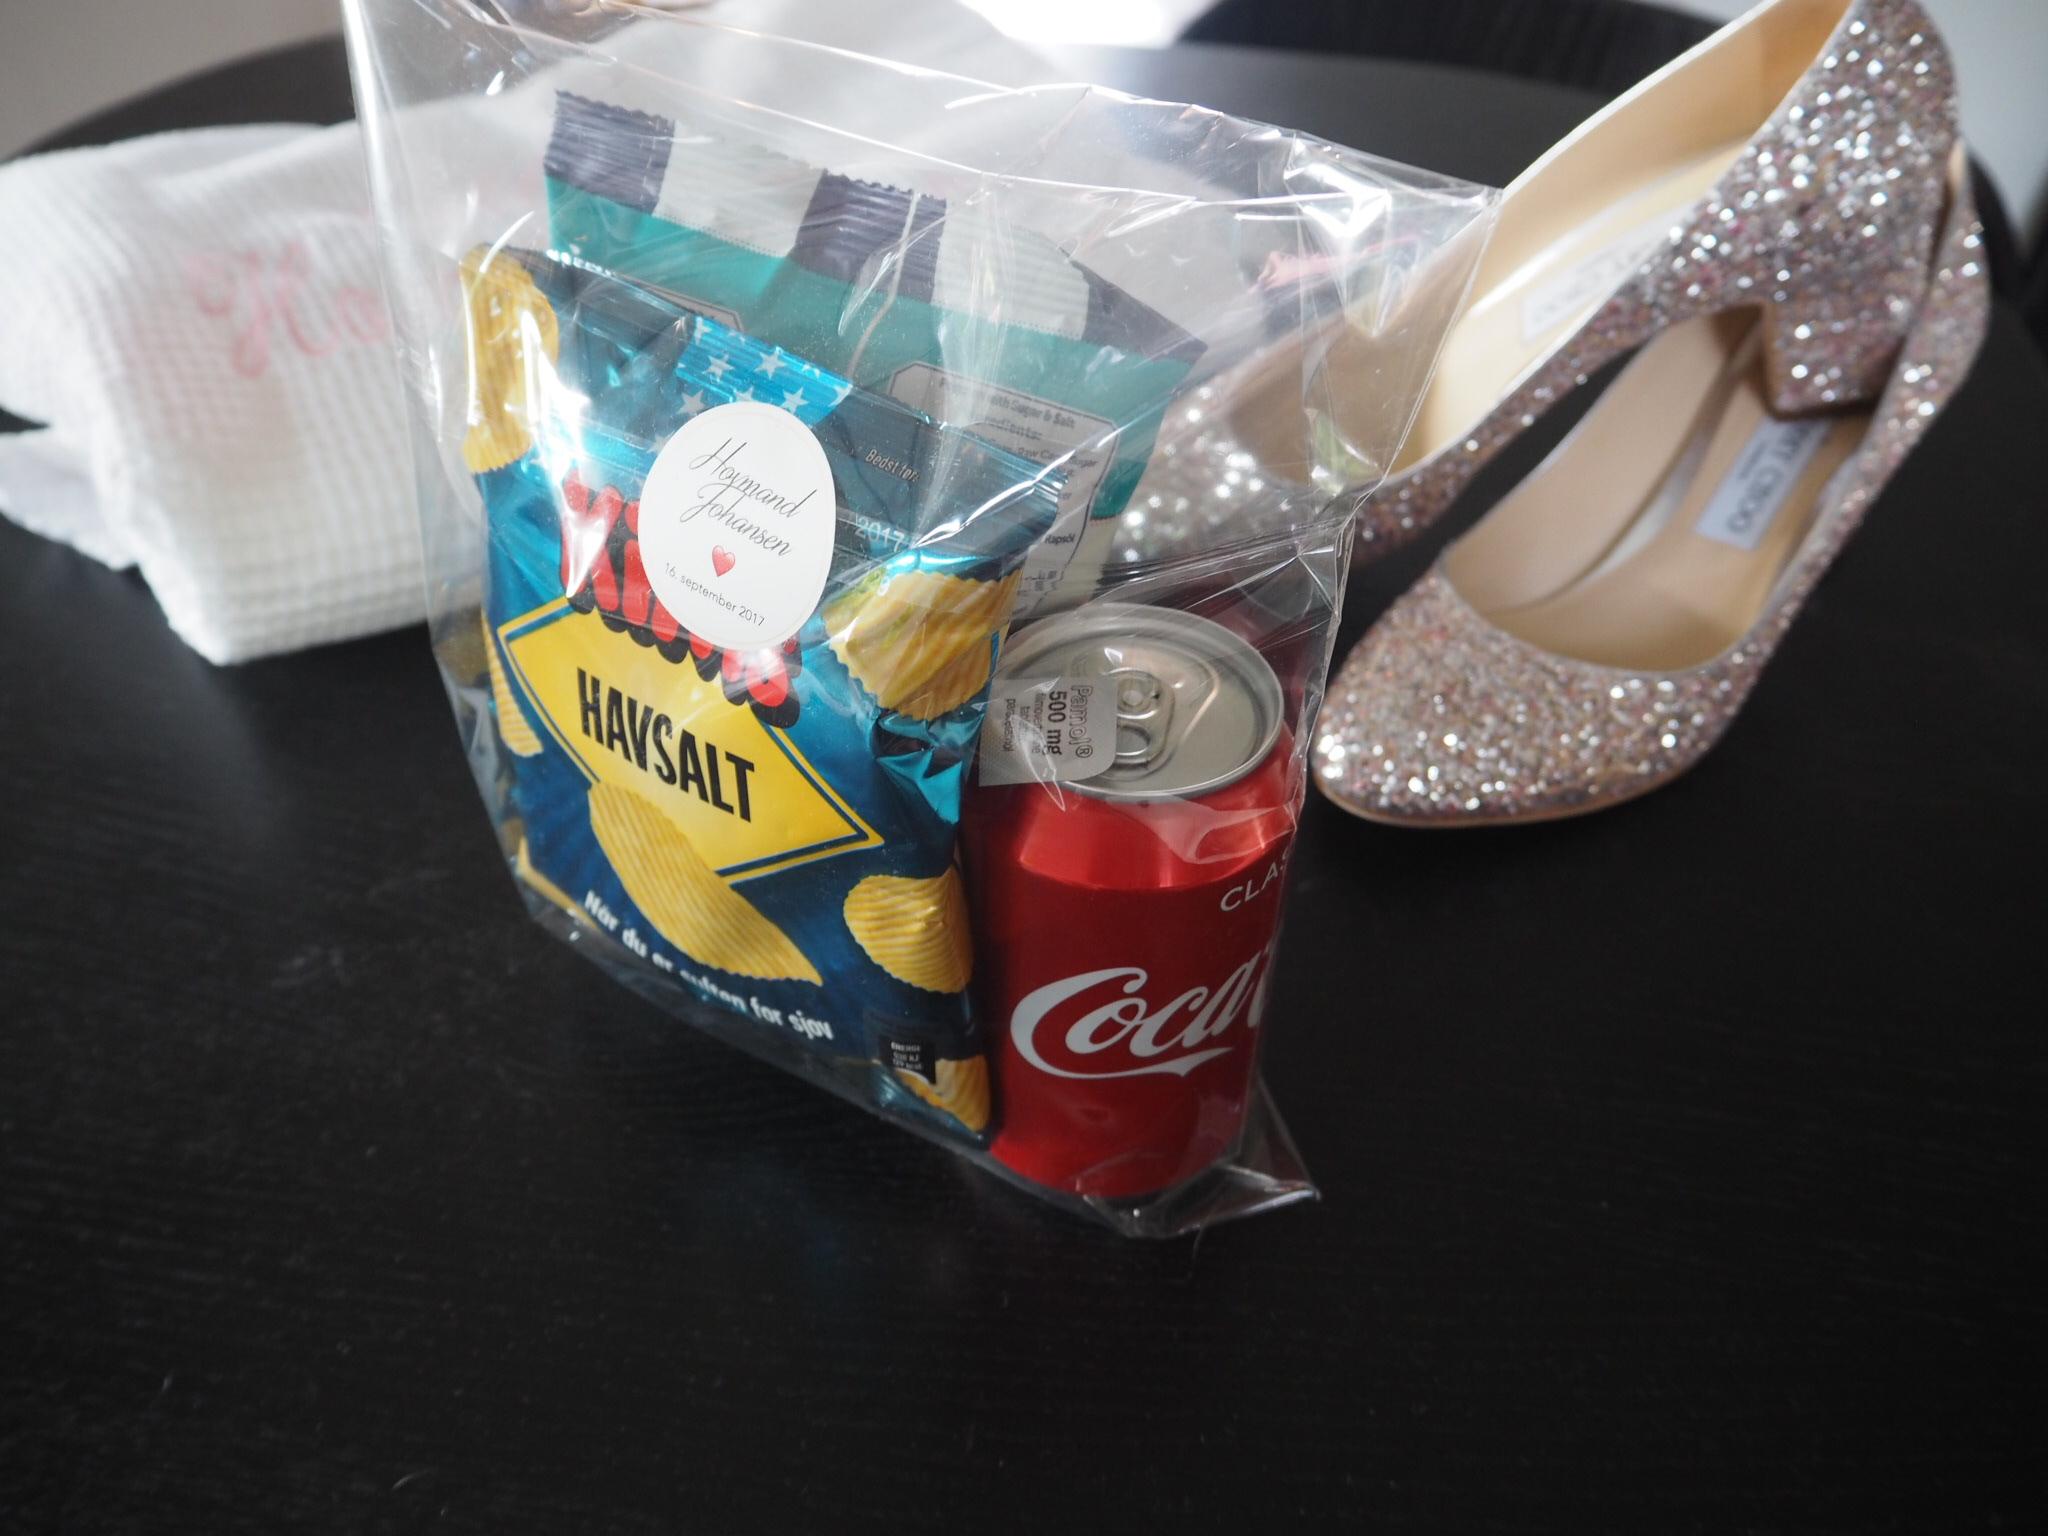 goodiebag til bryllup